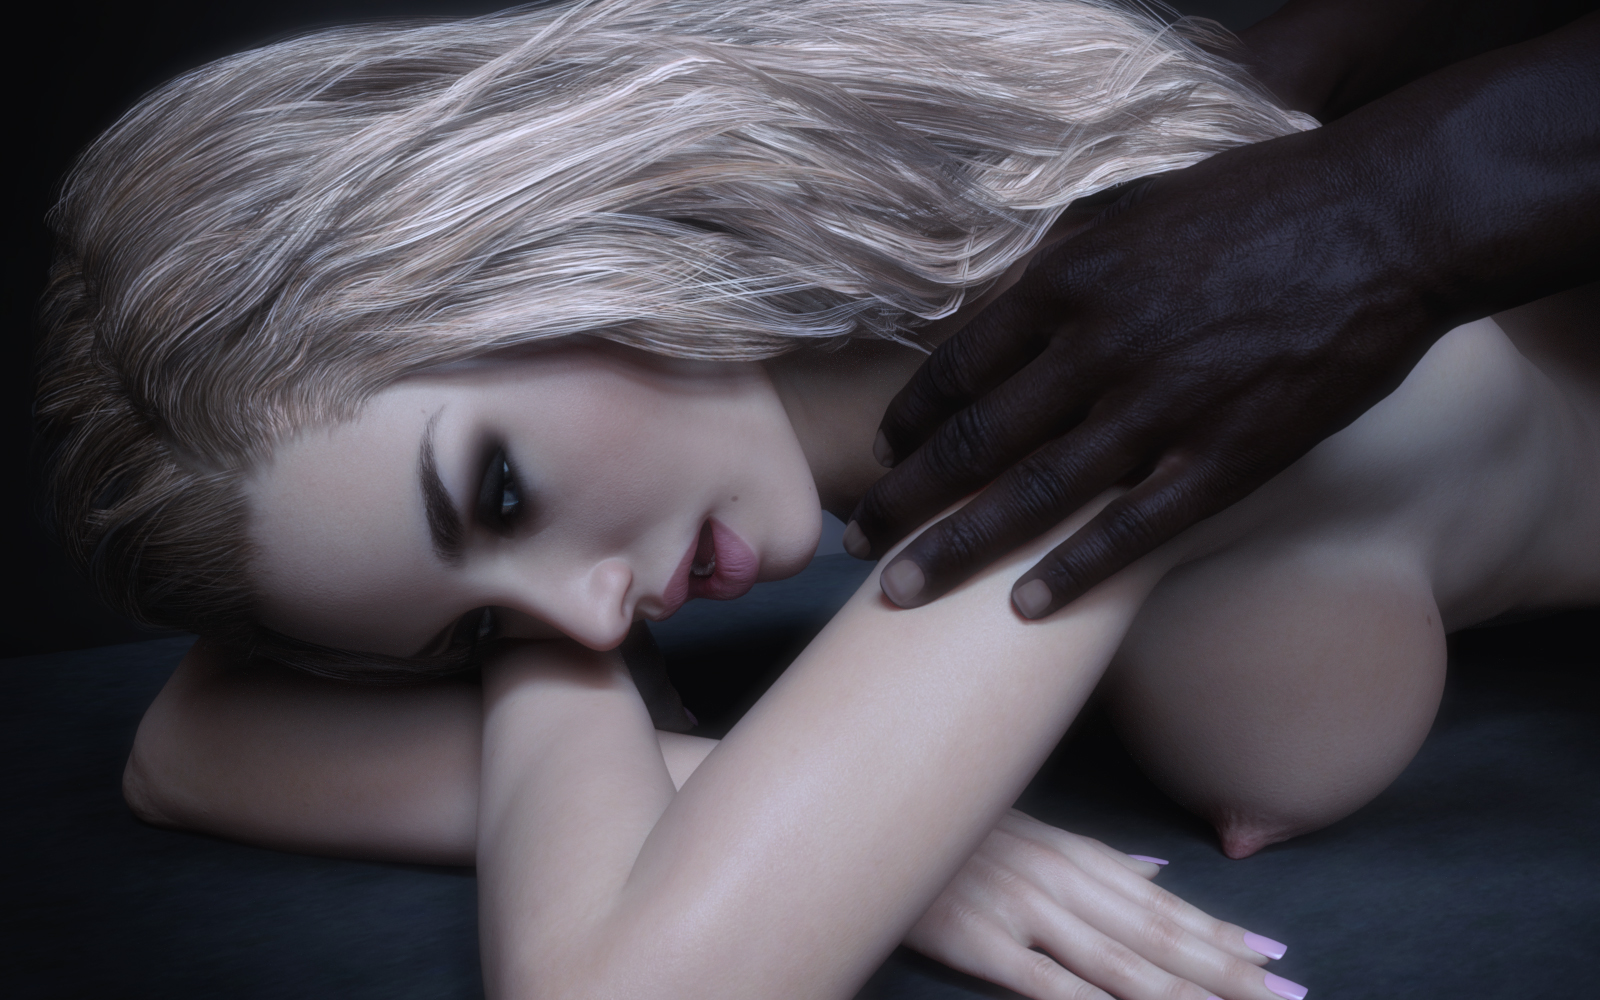 Sensual Shadows: The Massages (Part I)